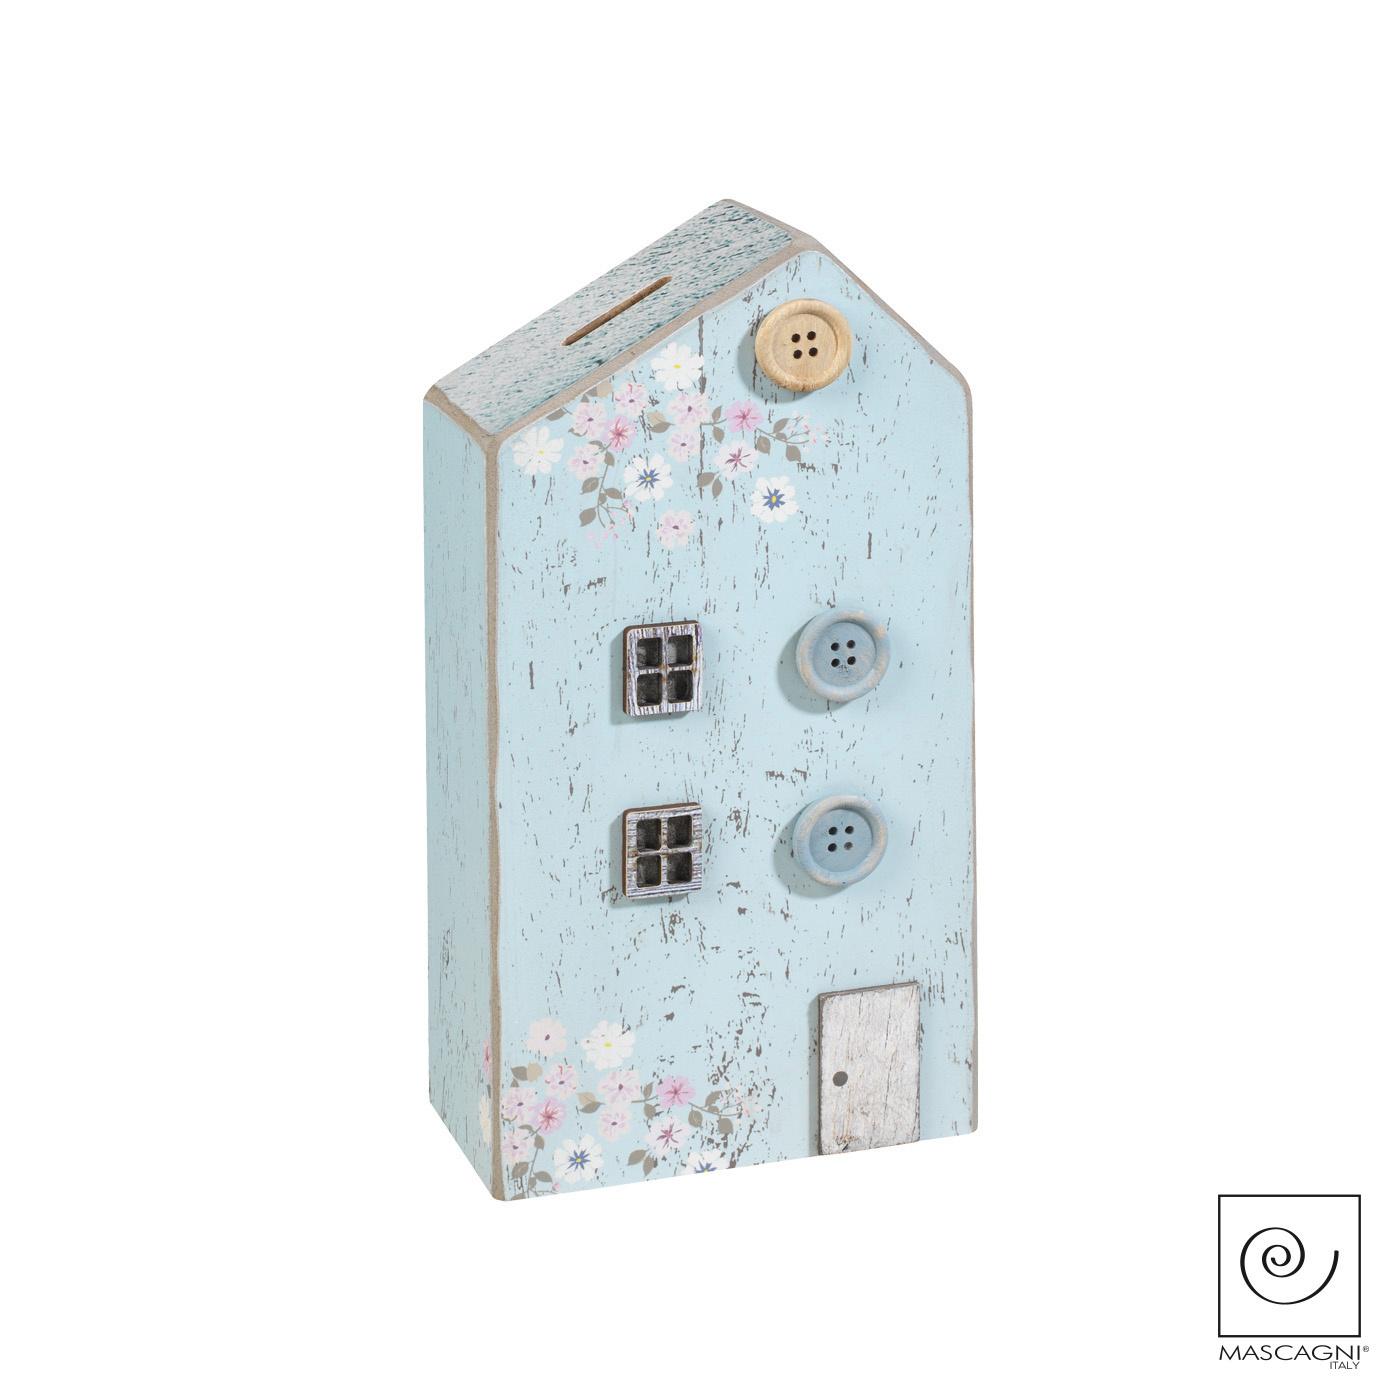 Art Mascagni A954 MONEY BOX